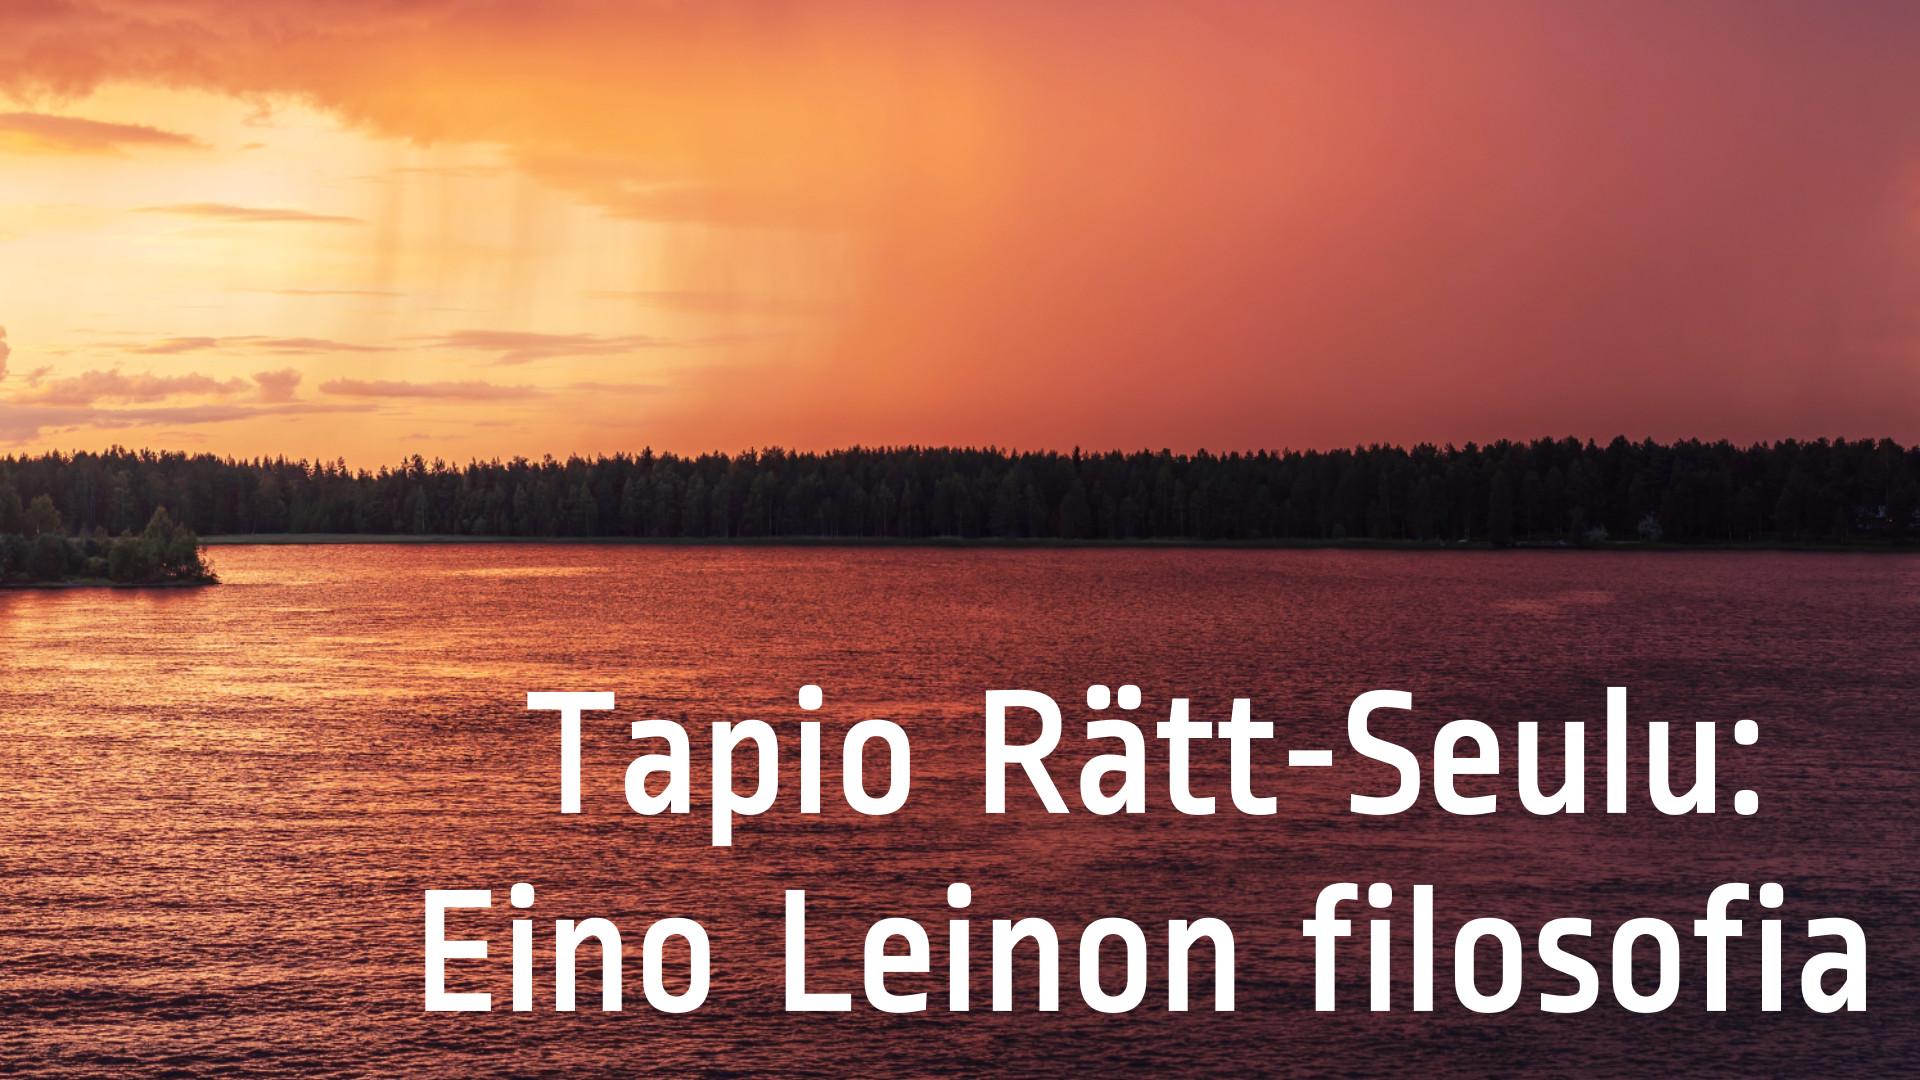 Ruusu-Risti ry:n luento:  Eino Leinon filosofia, Tapio Rätt-Seule